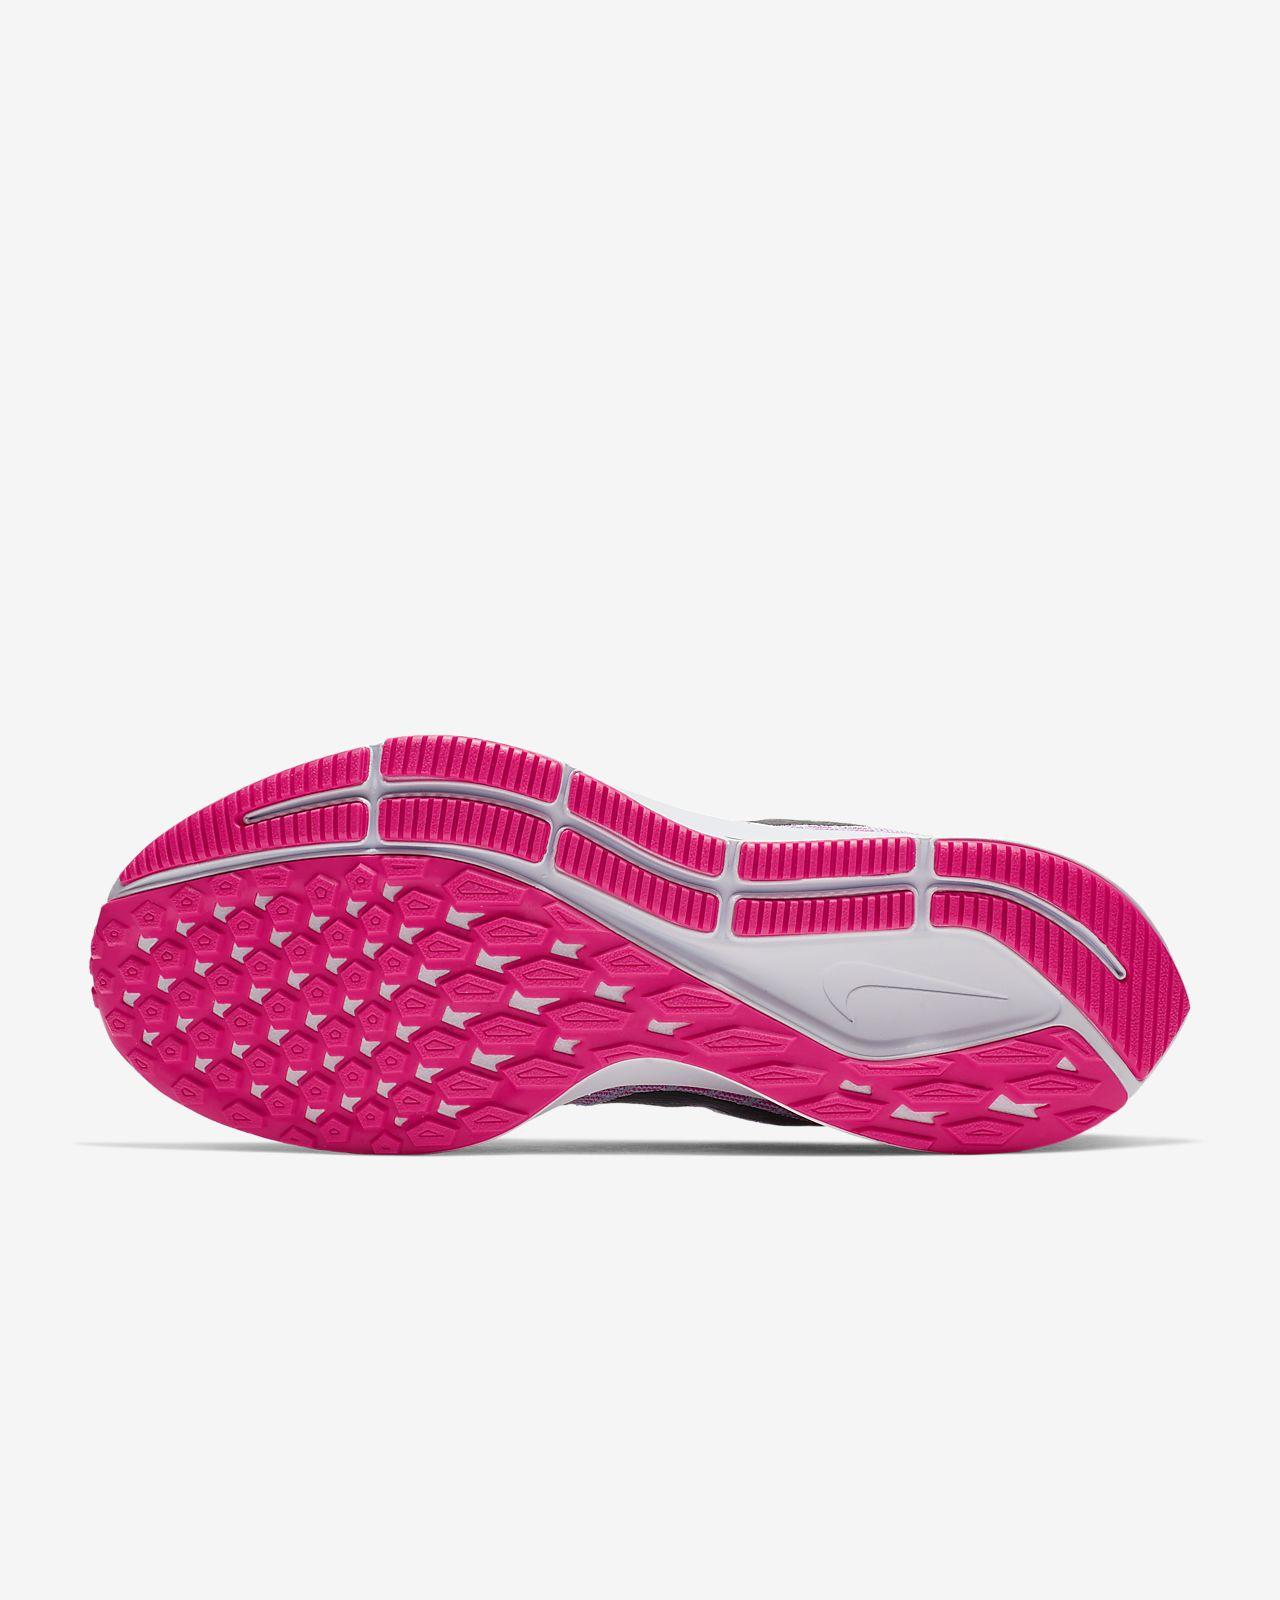 5fc2982eb1c99 Calzado de running para mujer Nike Air Zoom Pegasus 35. Nike.com MX